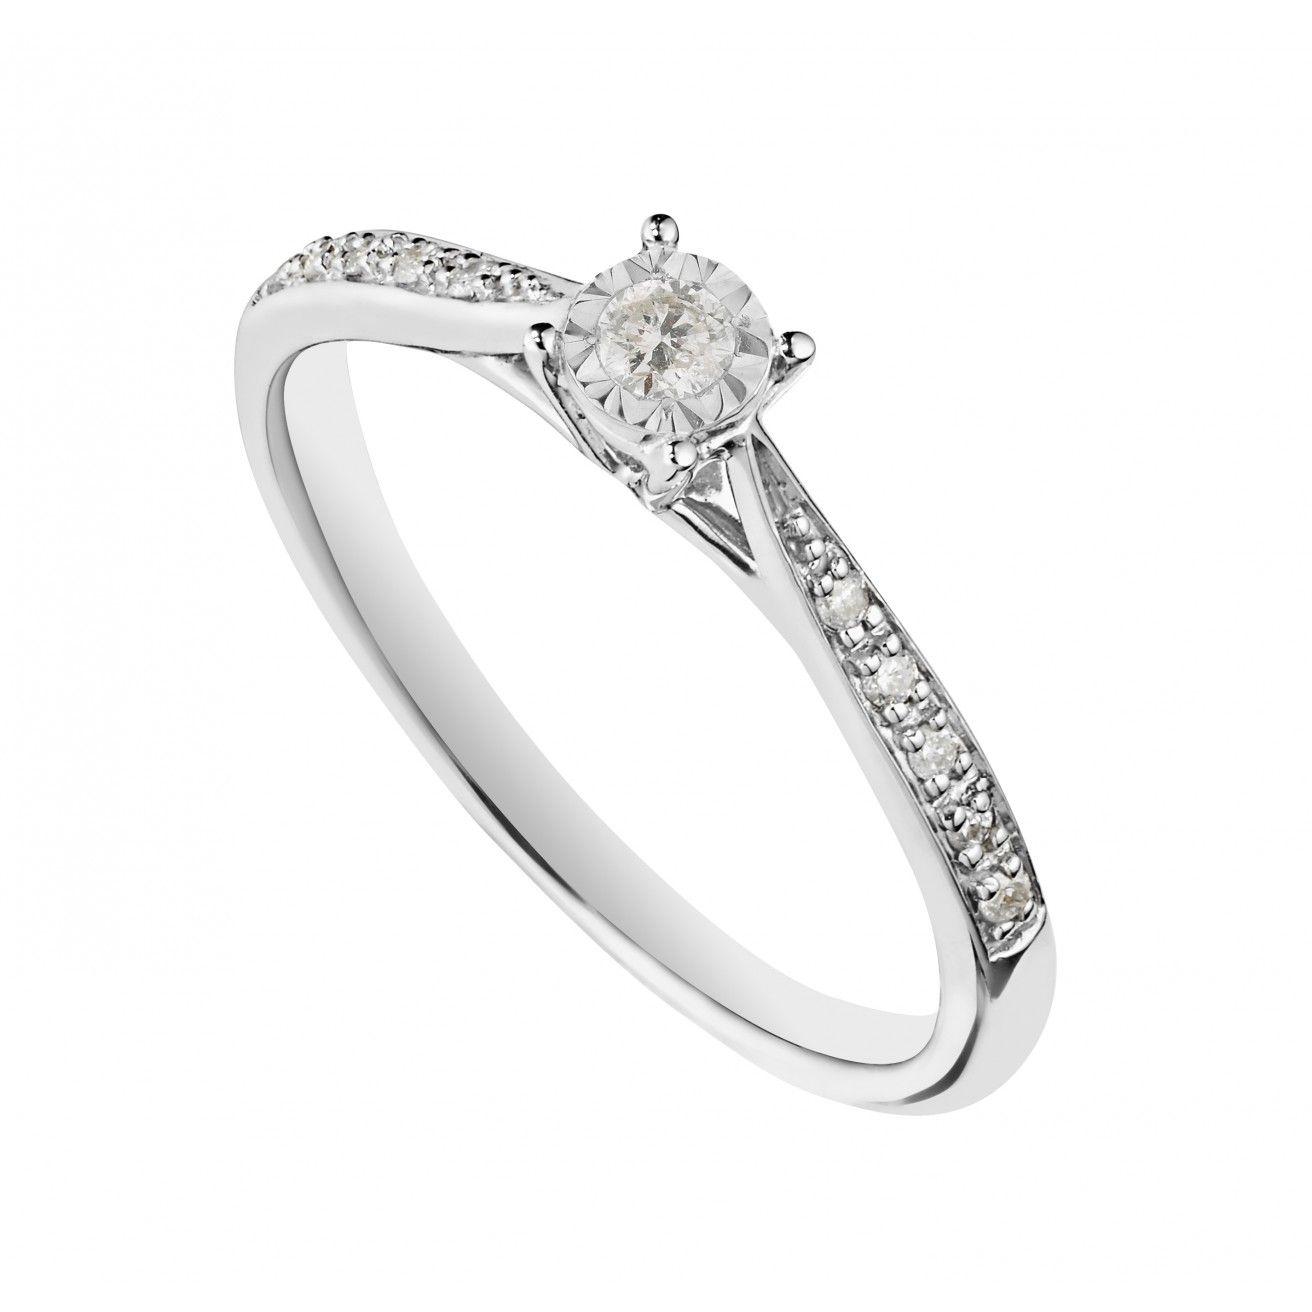 29df4cd6426d1 Shop the finest 585 White Gold - Engagement Rings online Huge ...